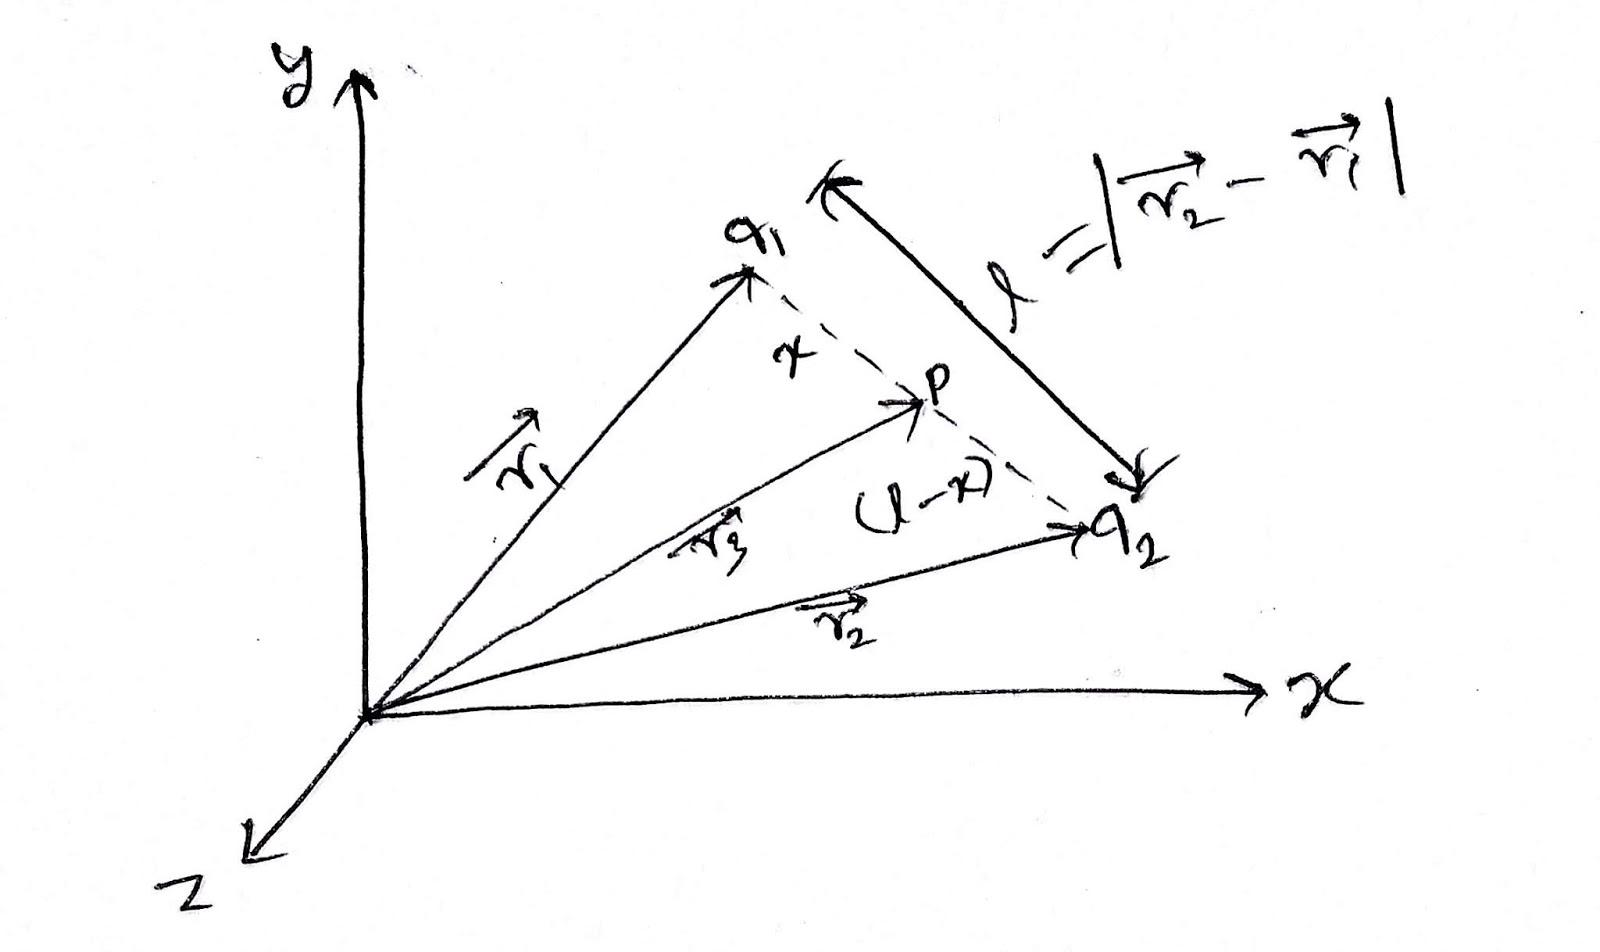 Irodov electromagnetism pdf basic of laws